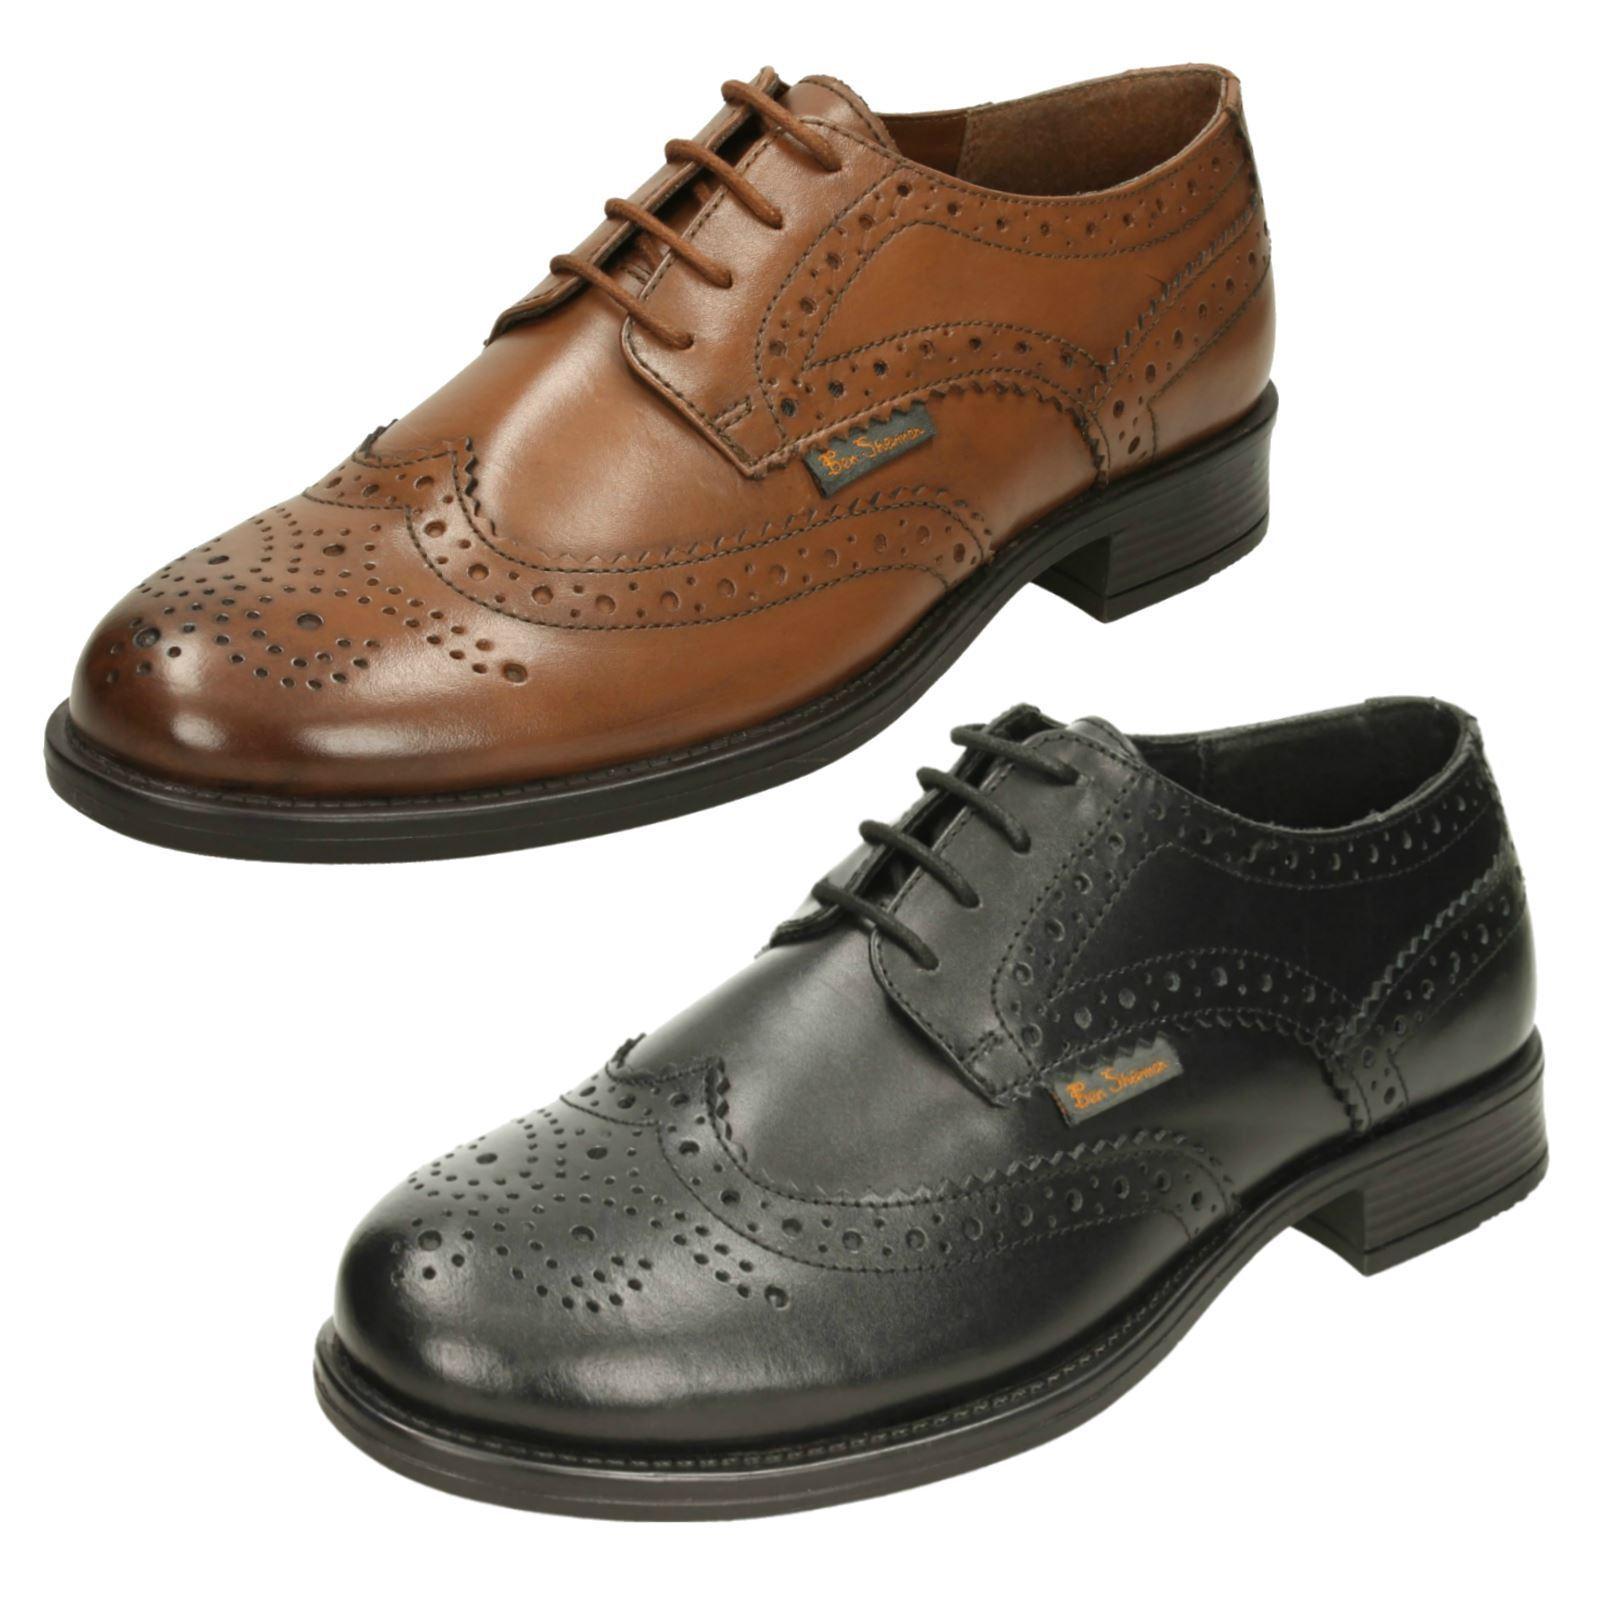 grande vendita Da Uomo Ben Sherman Formale Scarpe Scarpe Scarpe Simpson  presa di fabbrica